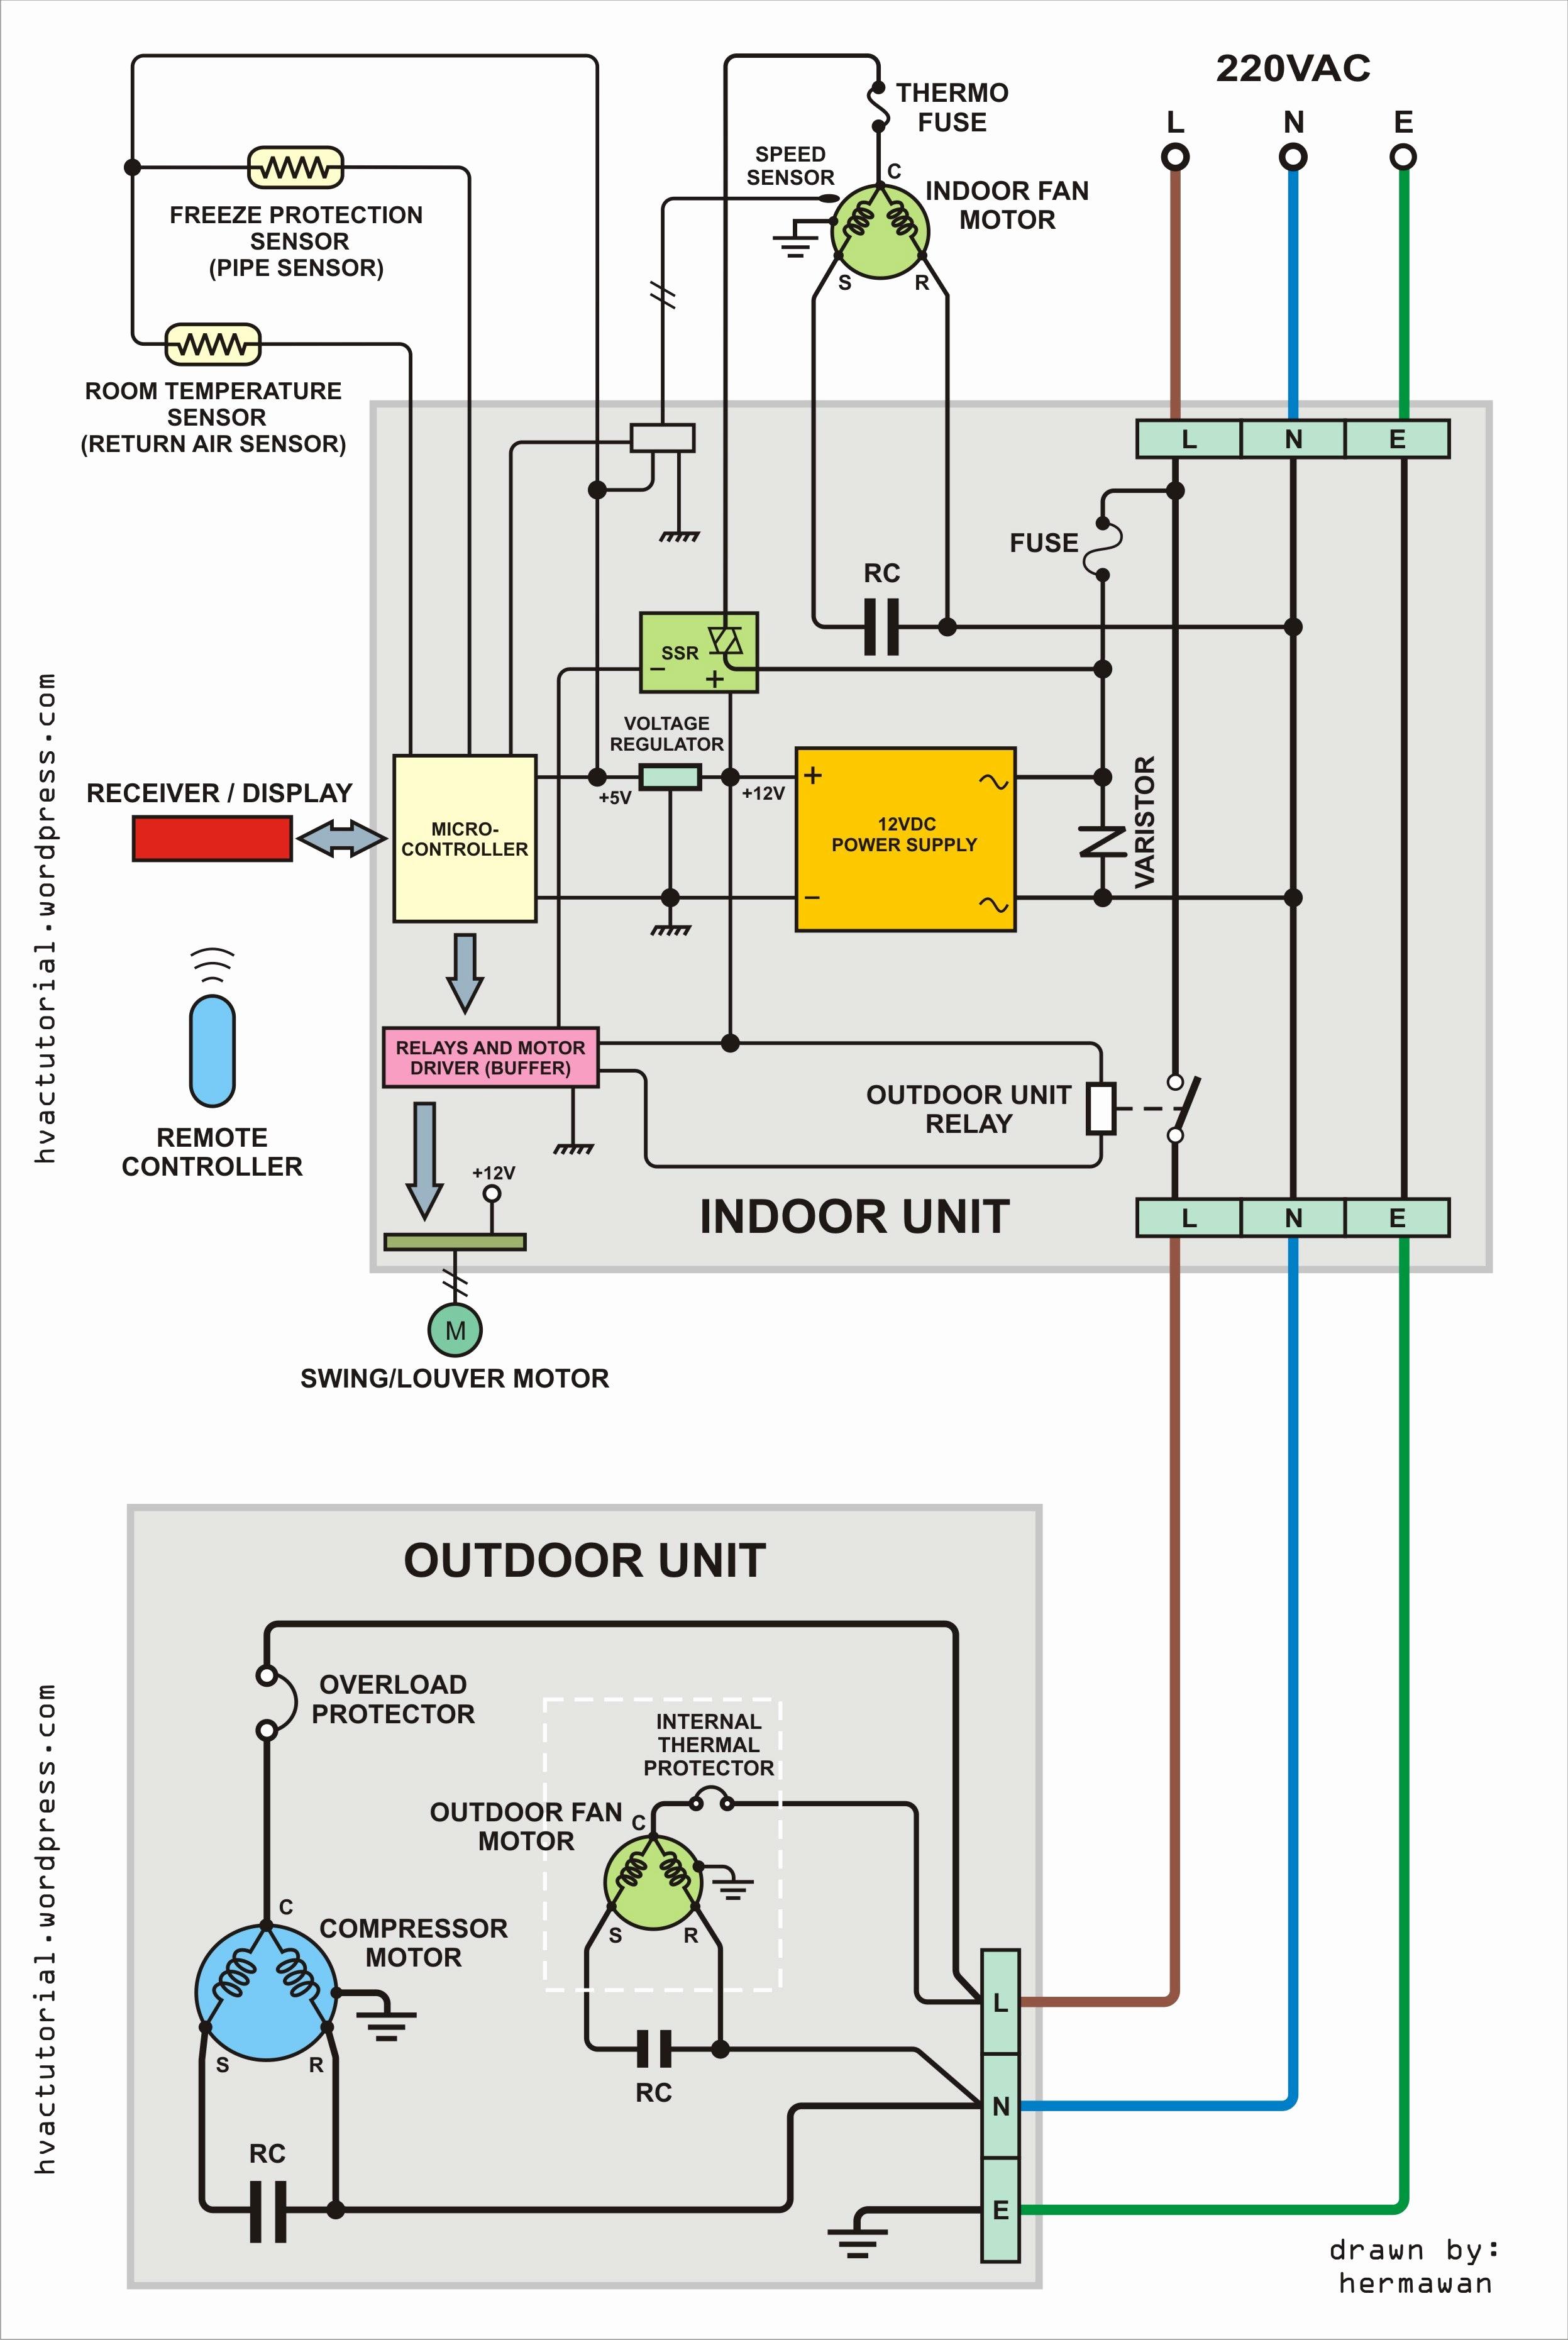 Air Conditioning Wiring Diagram | Wiring Diagram - Hvac Wiring Diagram